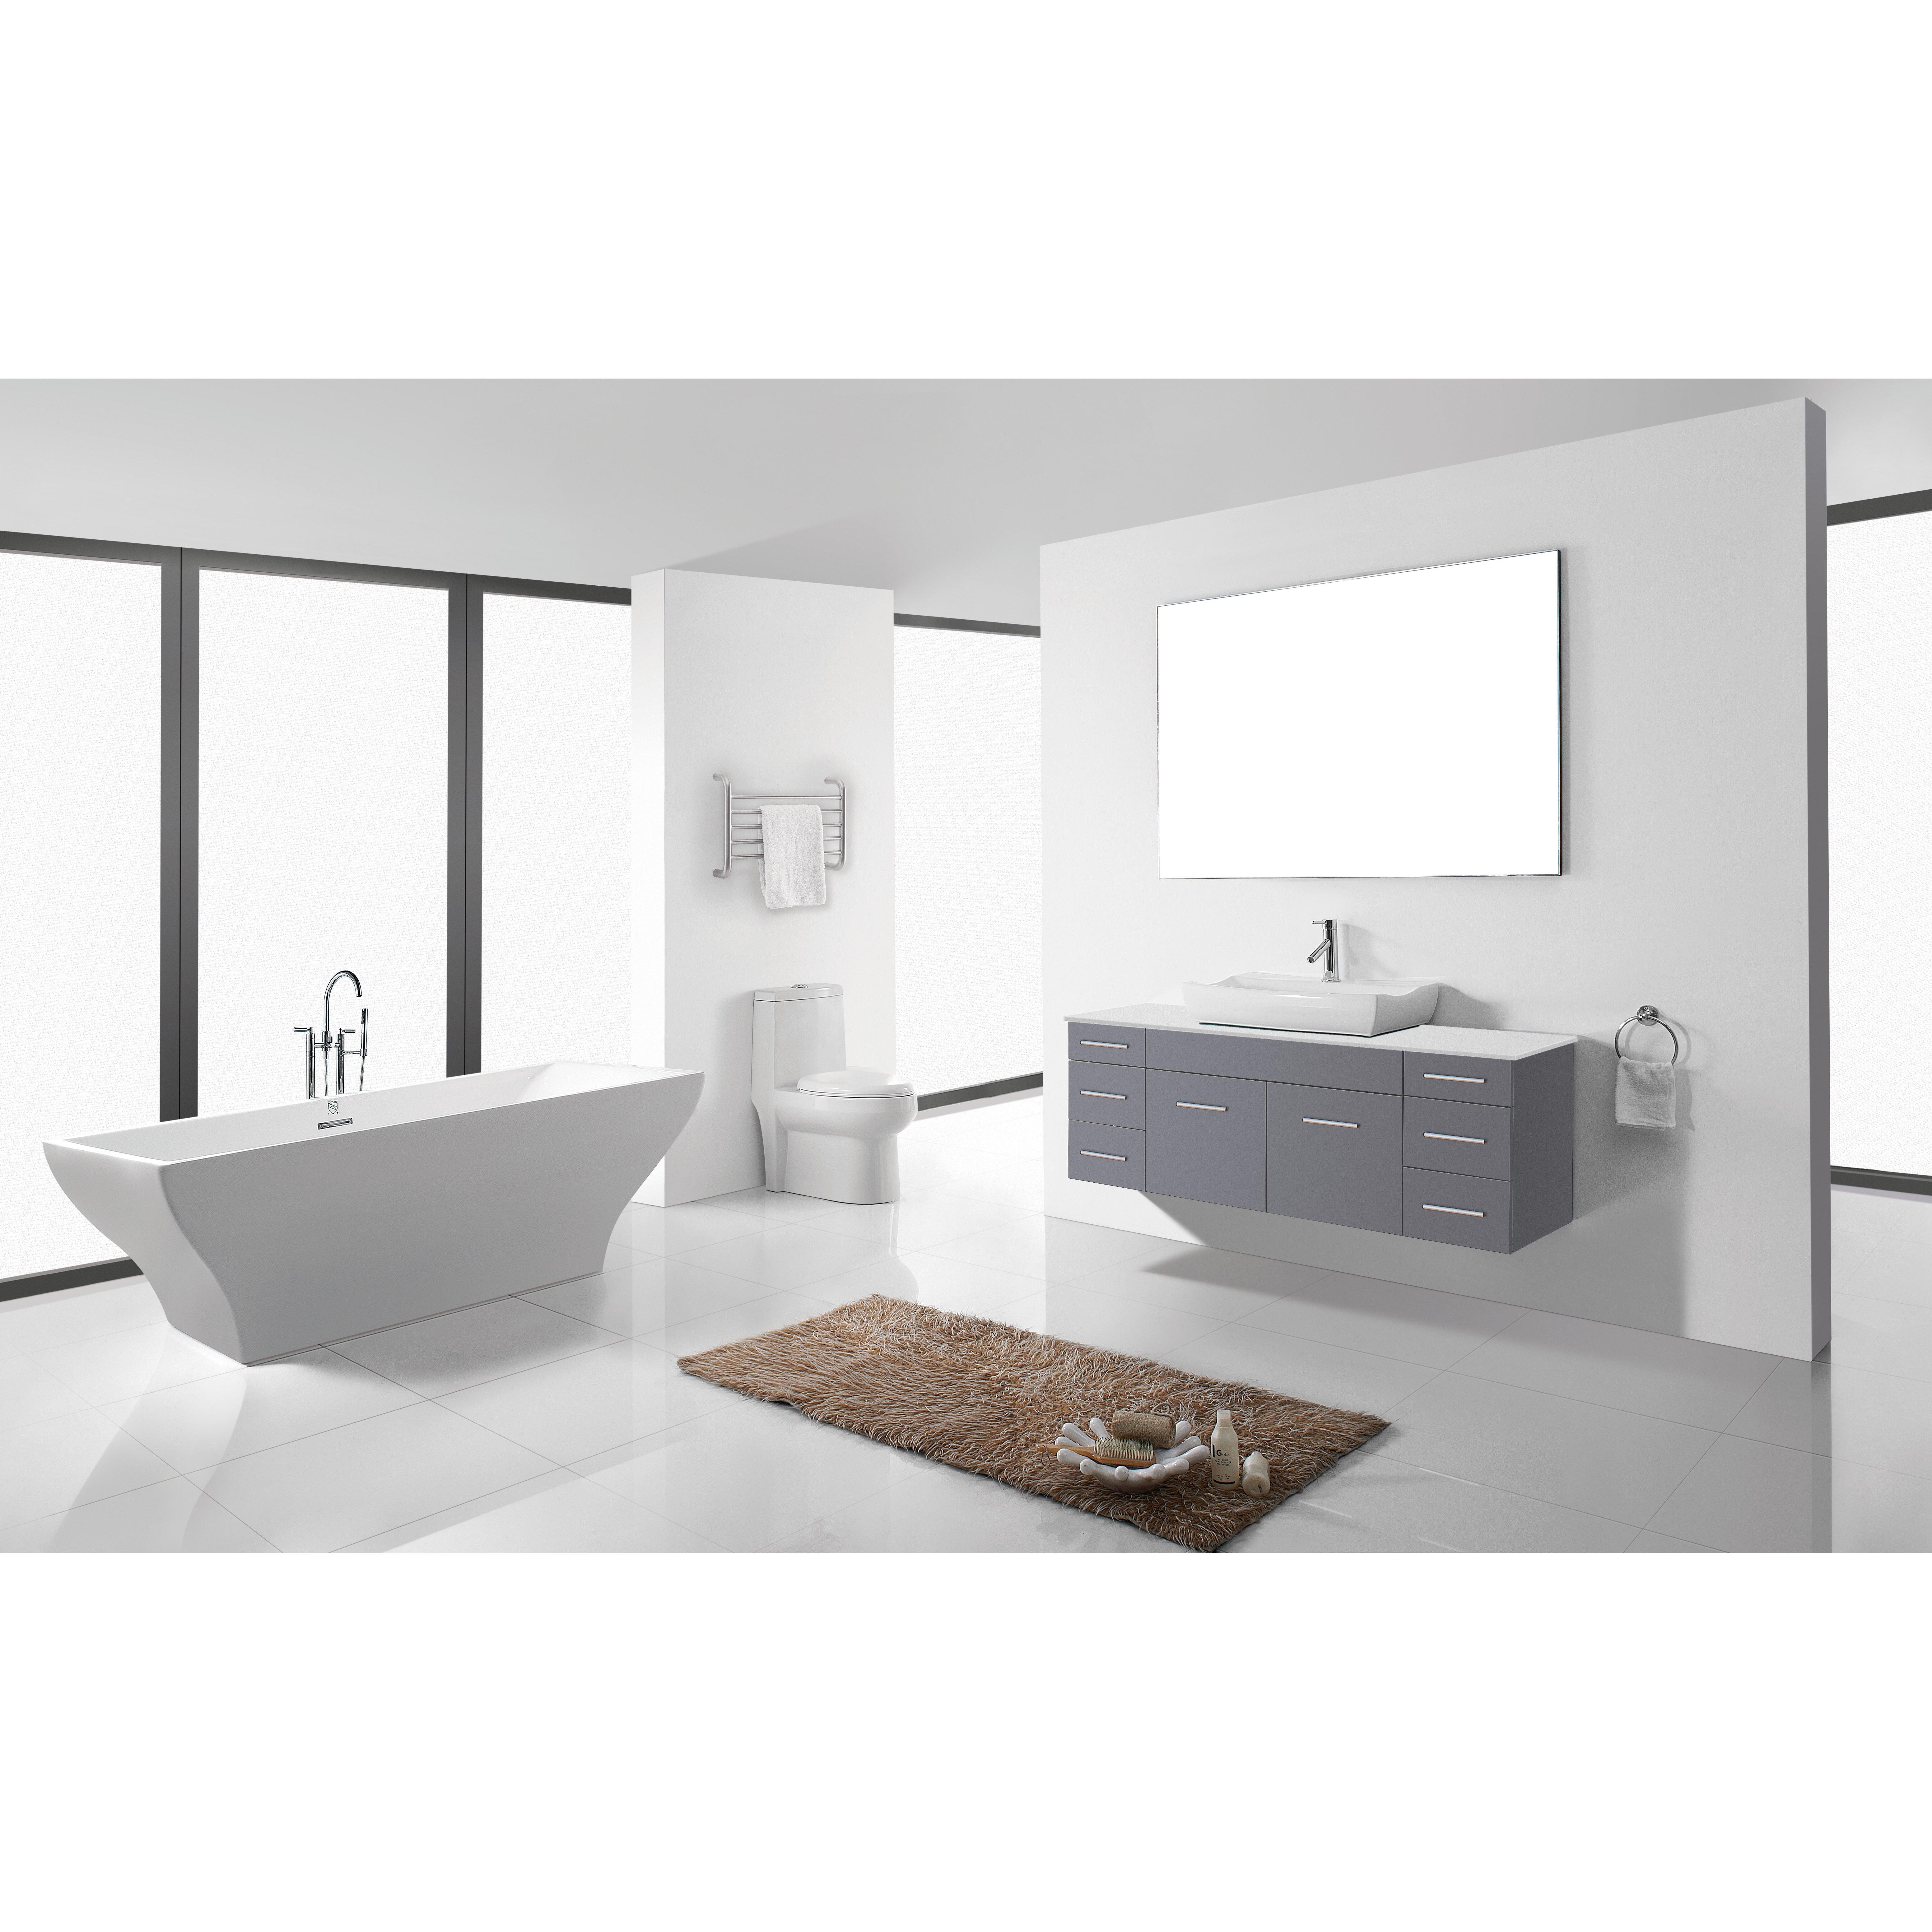 Virtu ultra modern series 56 single bathroom vanity set for Bathroom mirror set